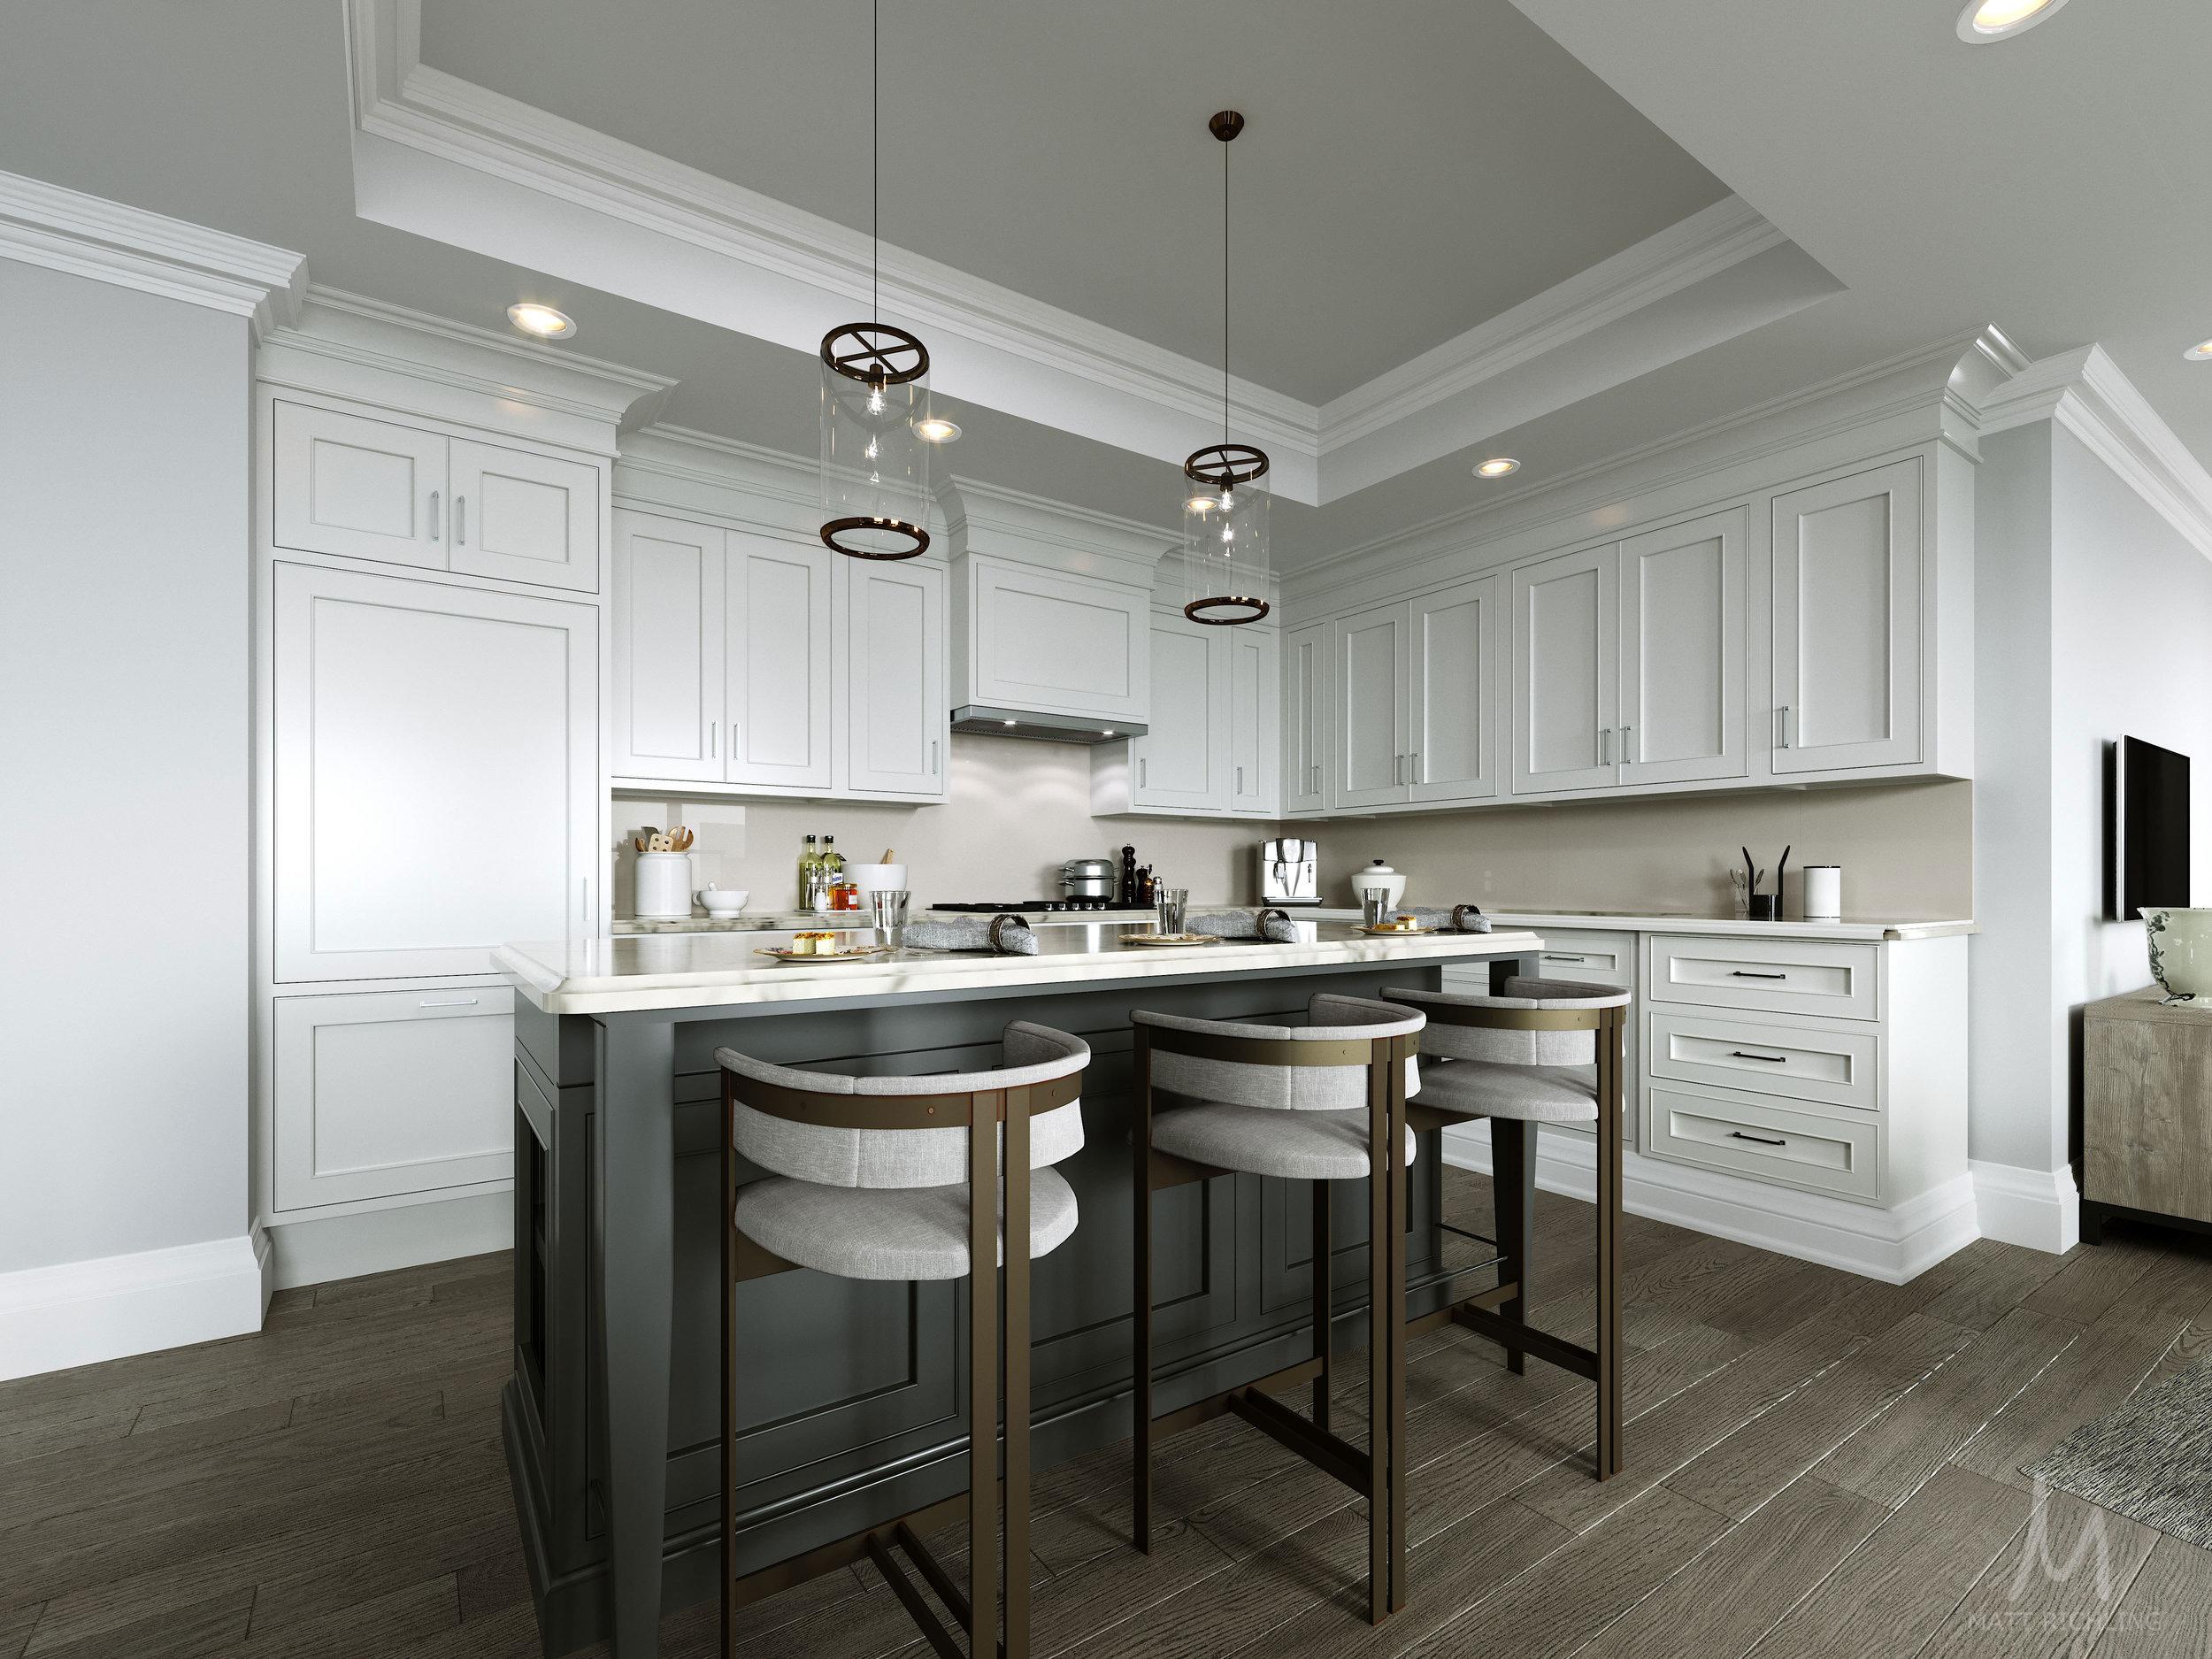 1451-wellington-kitchen-large.jpg